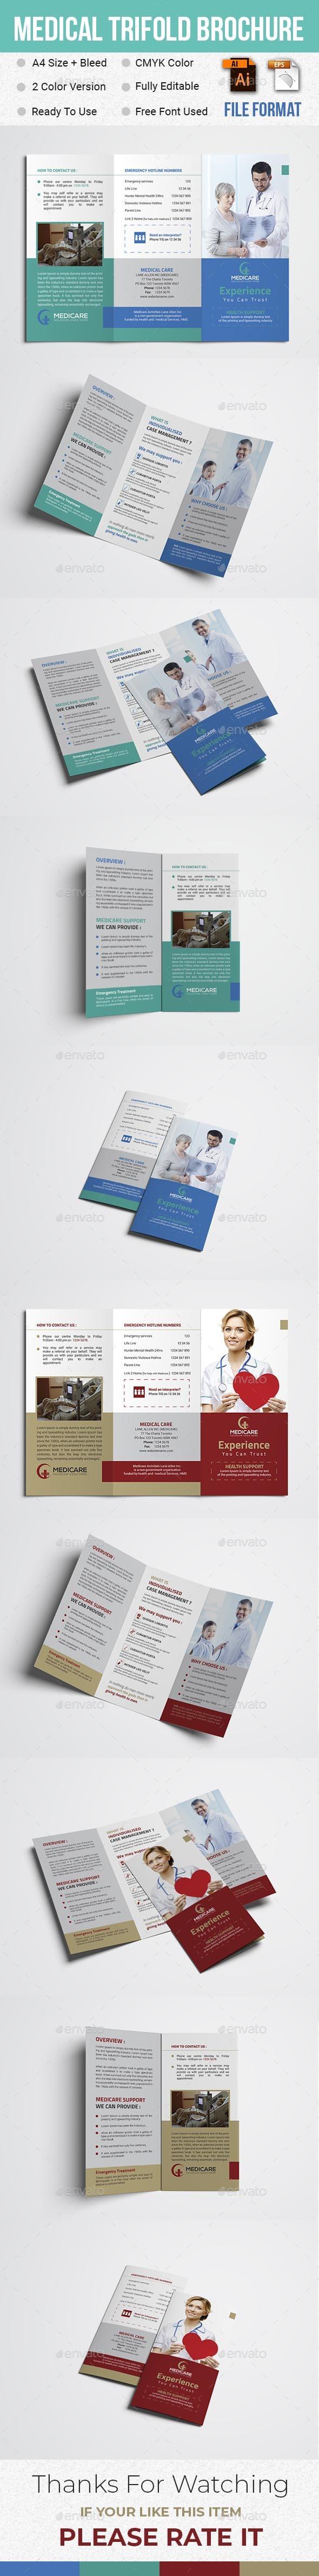 Medical Trifold Brochure - Brochures Print Templates